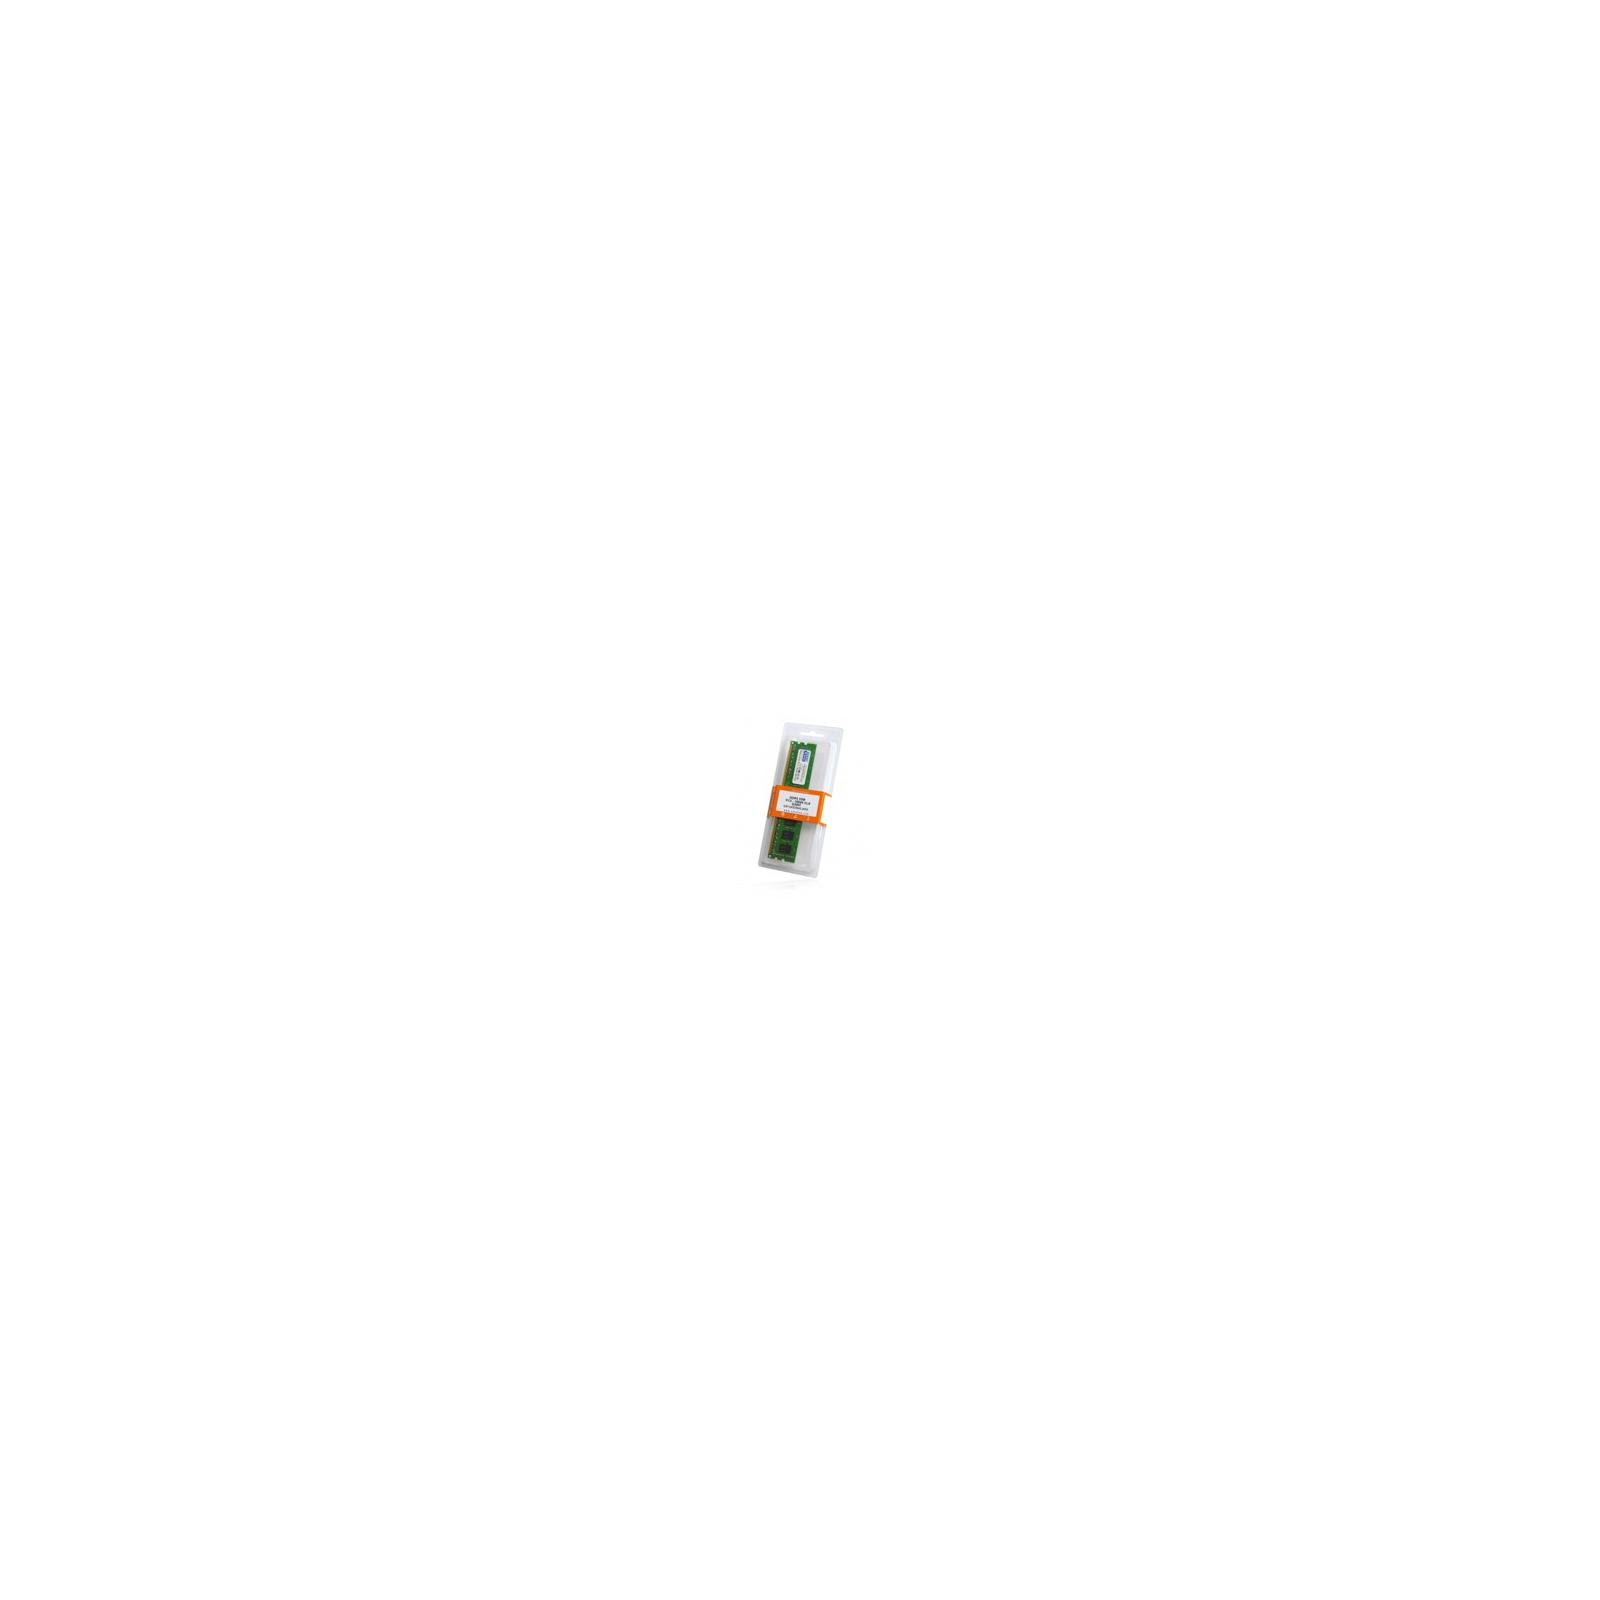 Модуль памяти для компьютера DDR3 1GB 1333 MHz GOODRAM (GR1333D364L9/1G)